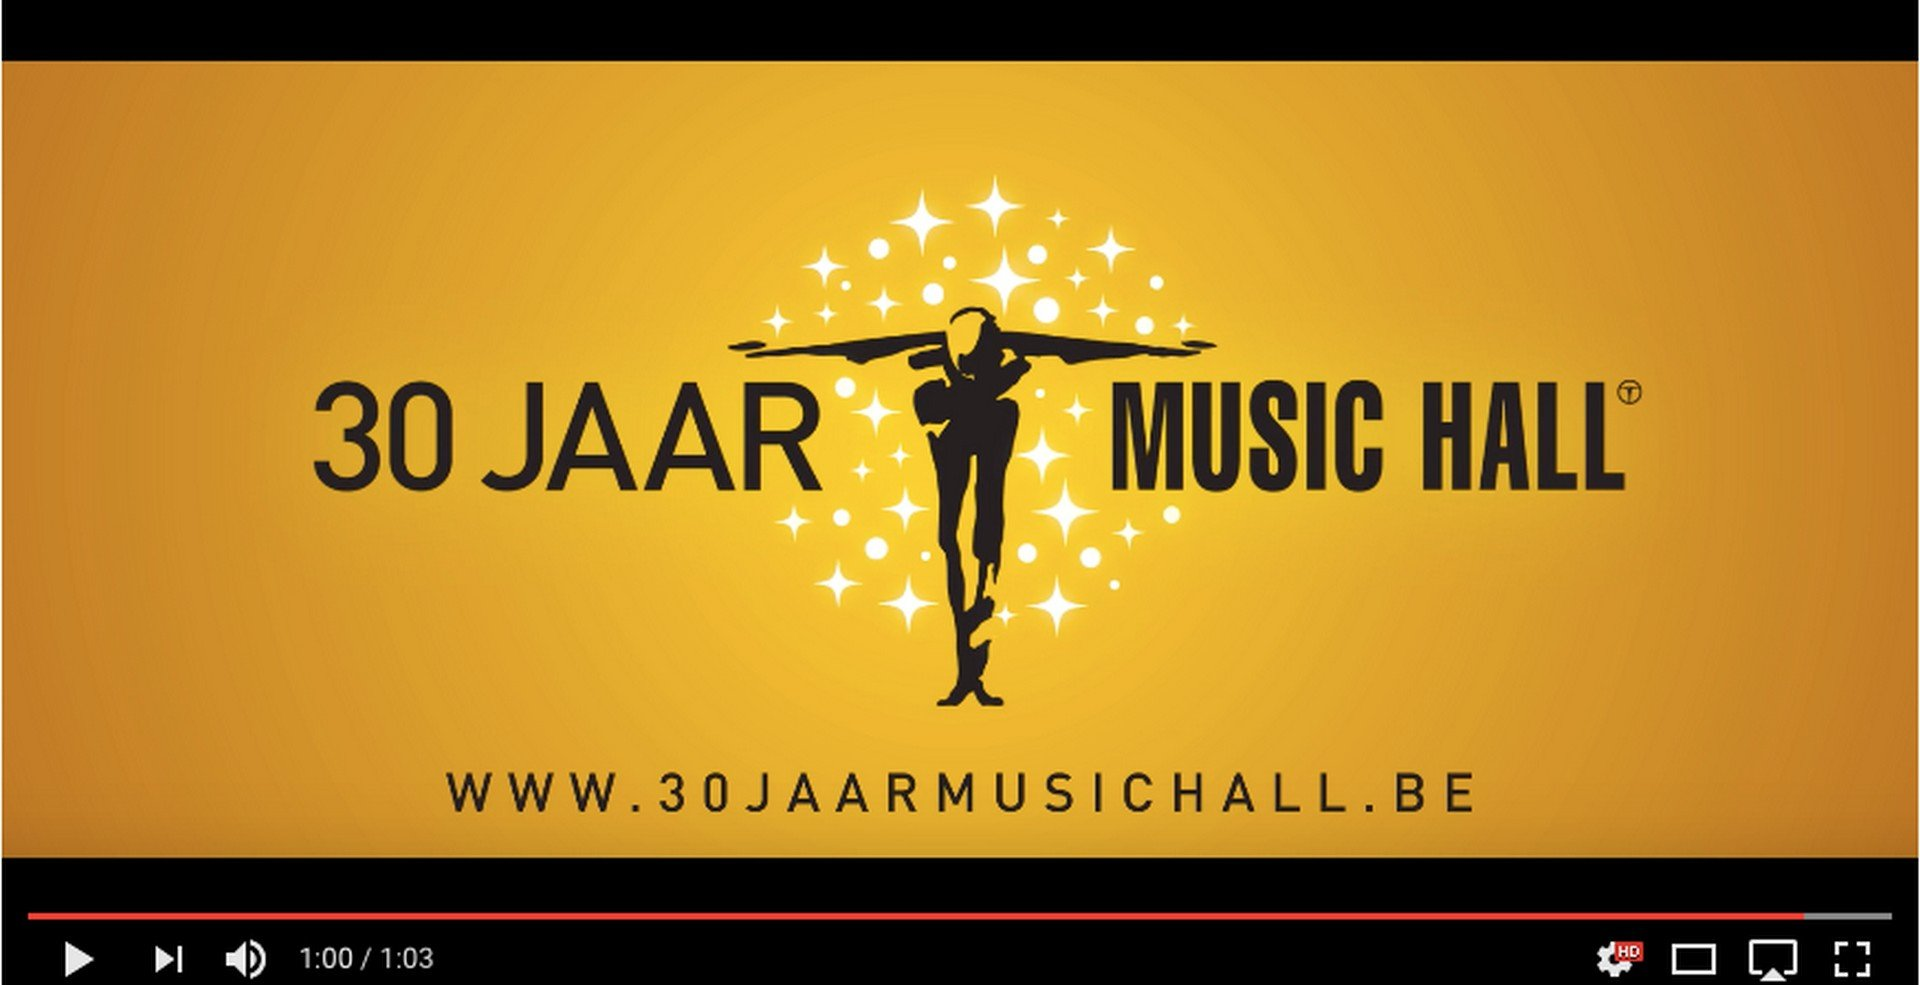 Music Hall Classics en Ballet du Grand Théâtre de Genève brengen 'Romeo & Julia' als modern dansspektakel - Logo Music Hall 30 jaar